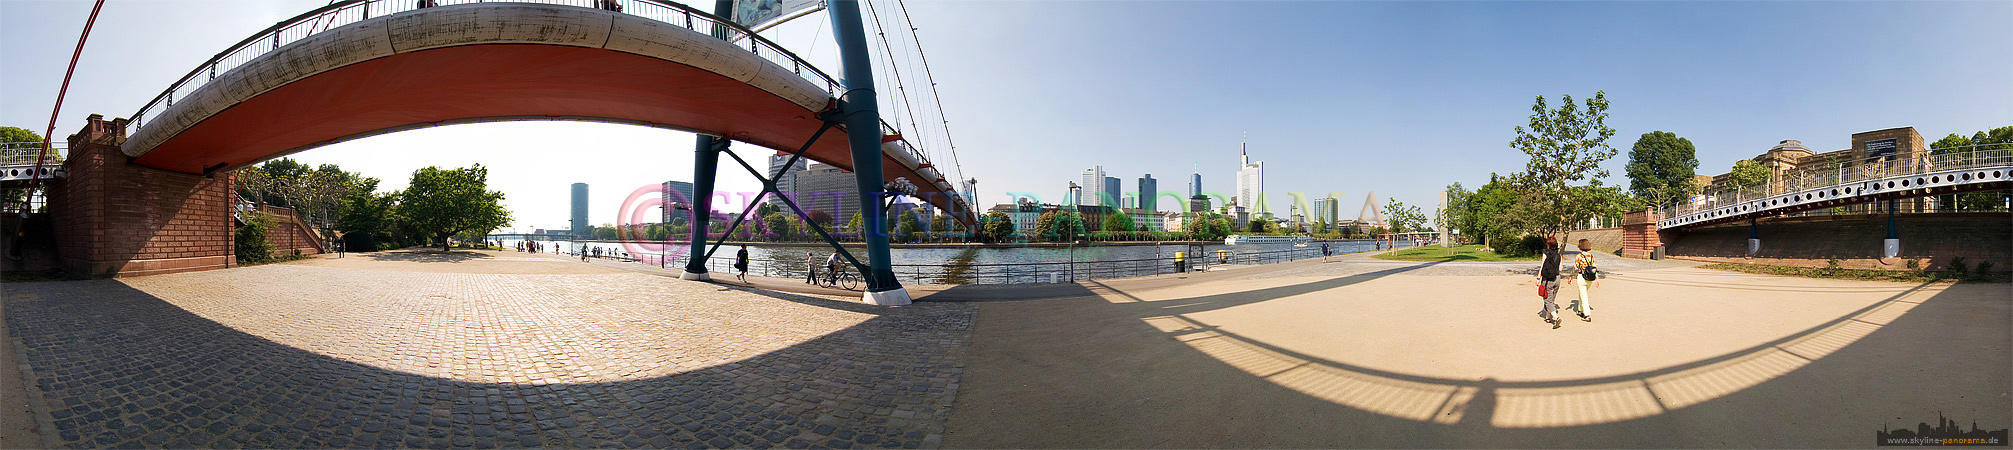 Frankfurt Museumsufer